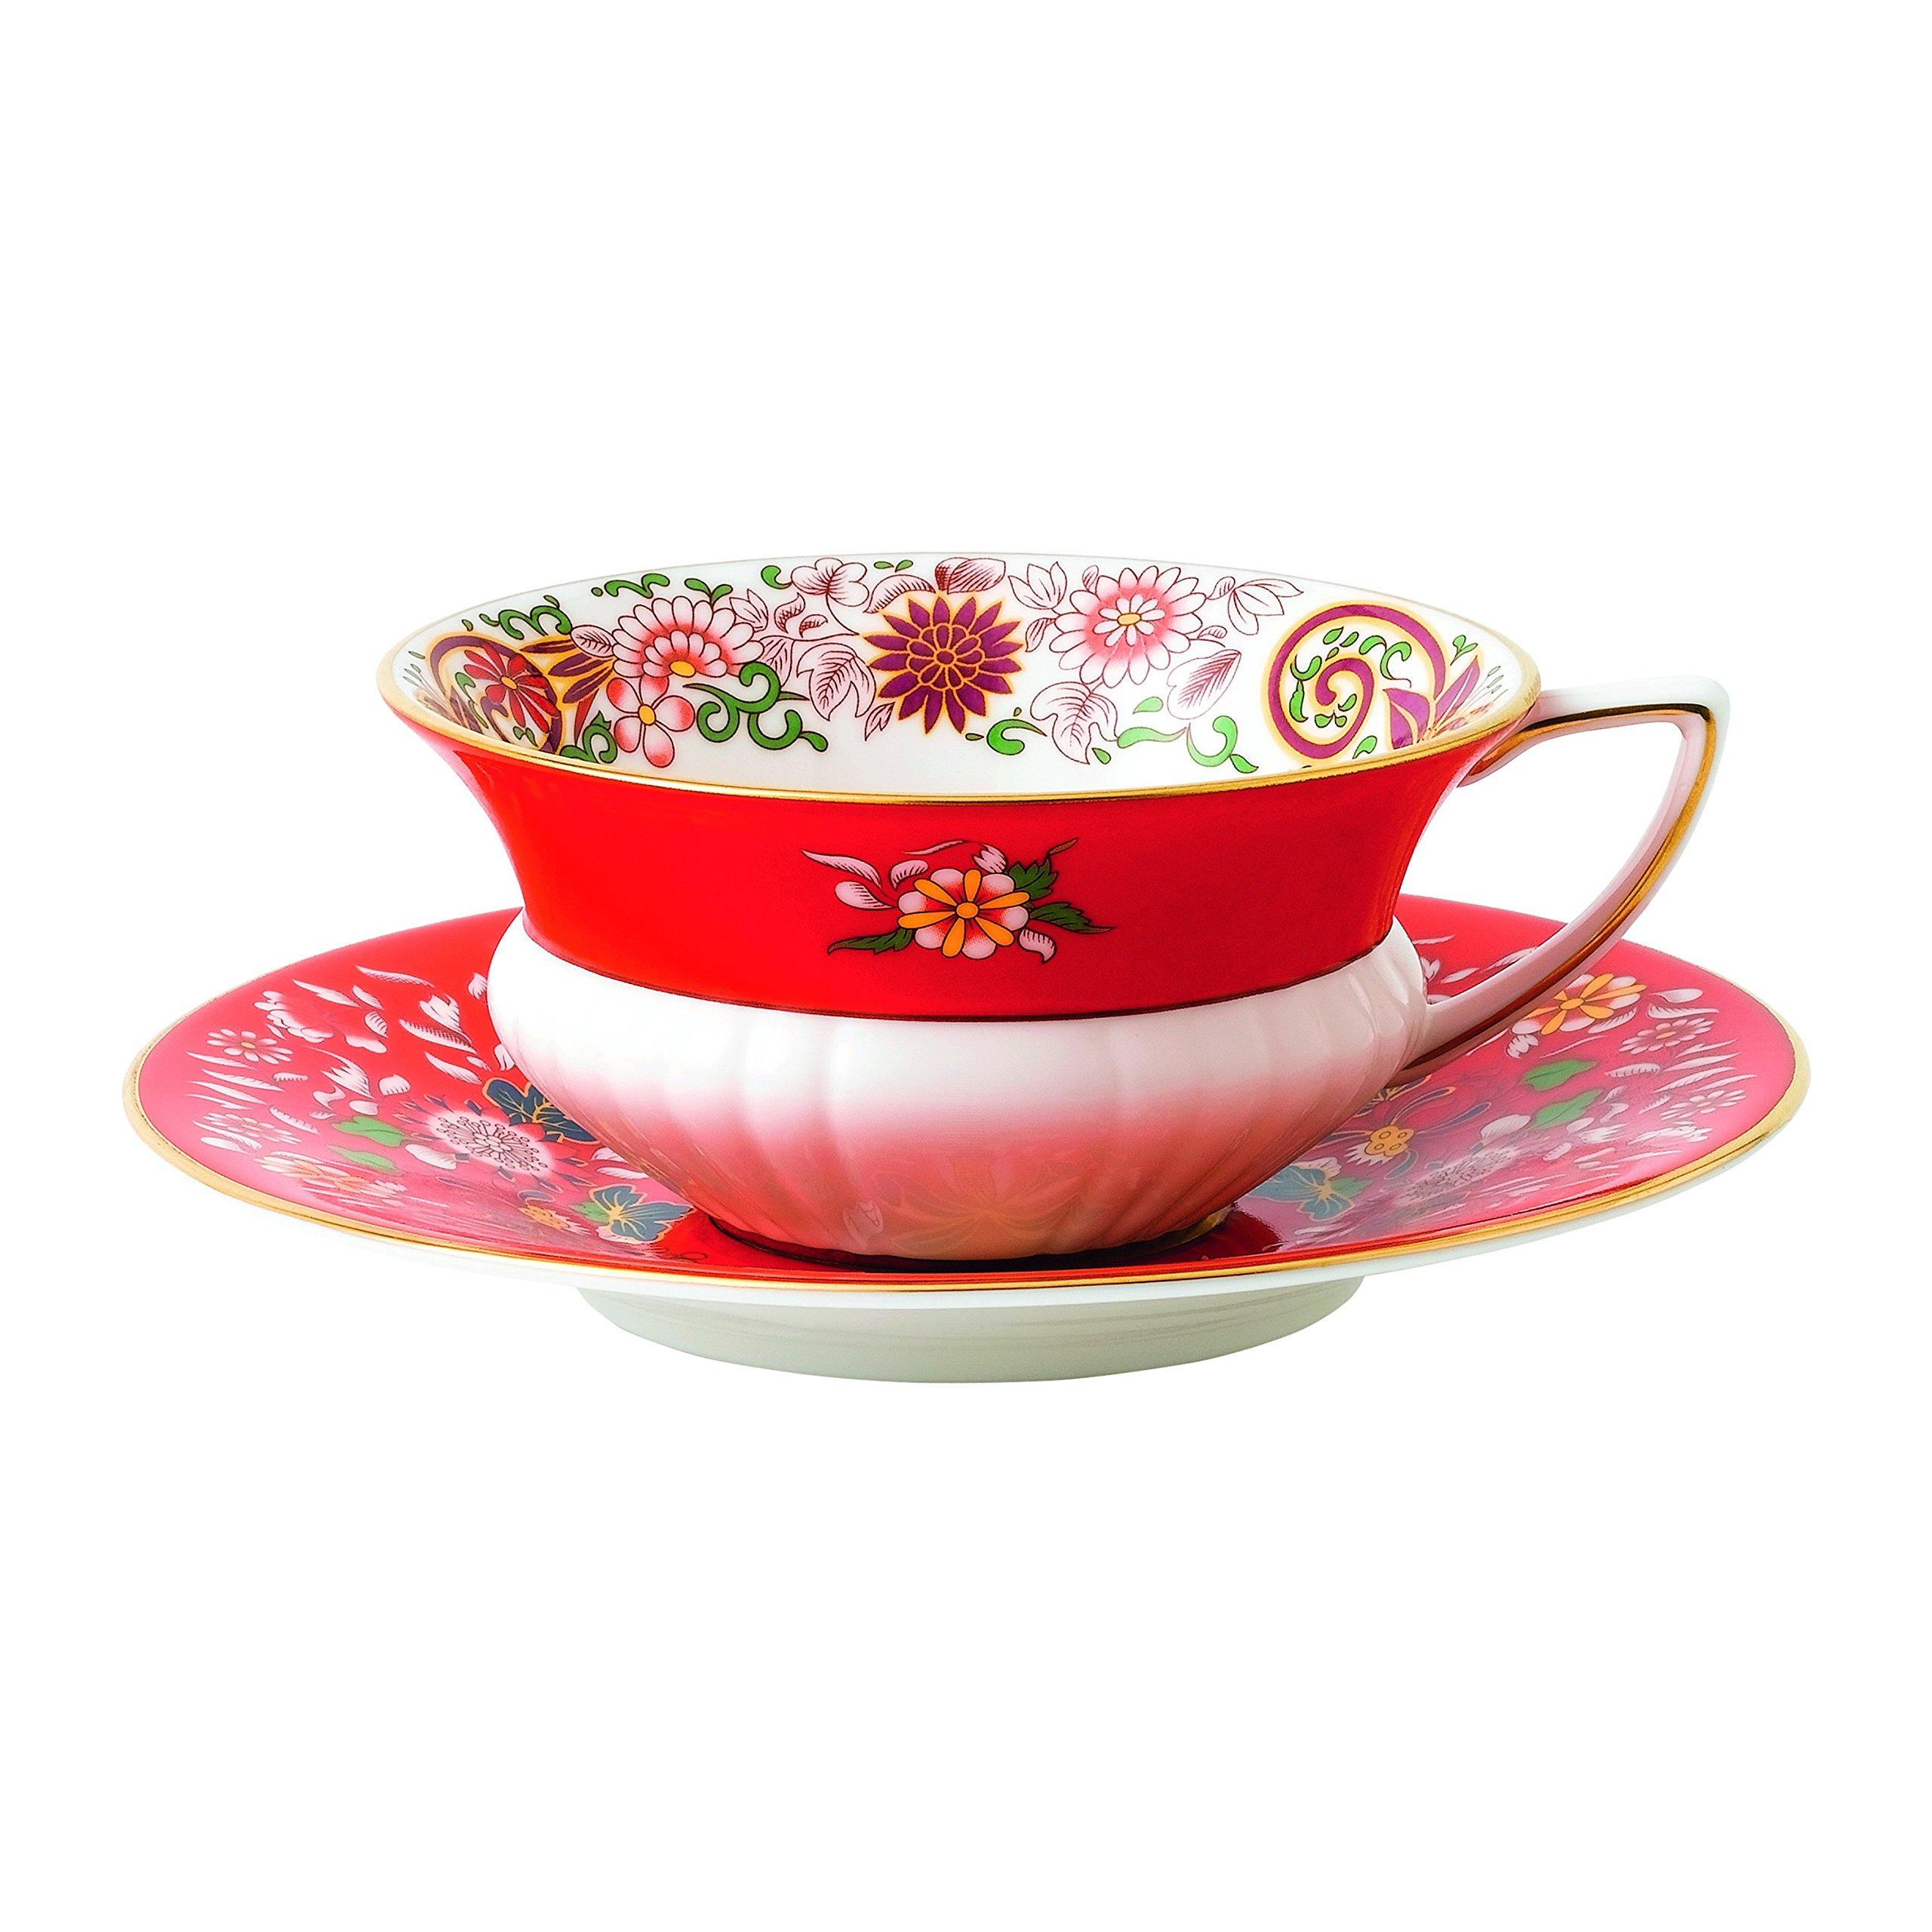 Wedgwood 40024021 Wonderlust Teacup & Saucer Set Crimson Orient, 2 Piece Jewel